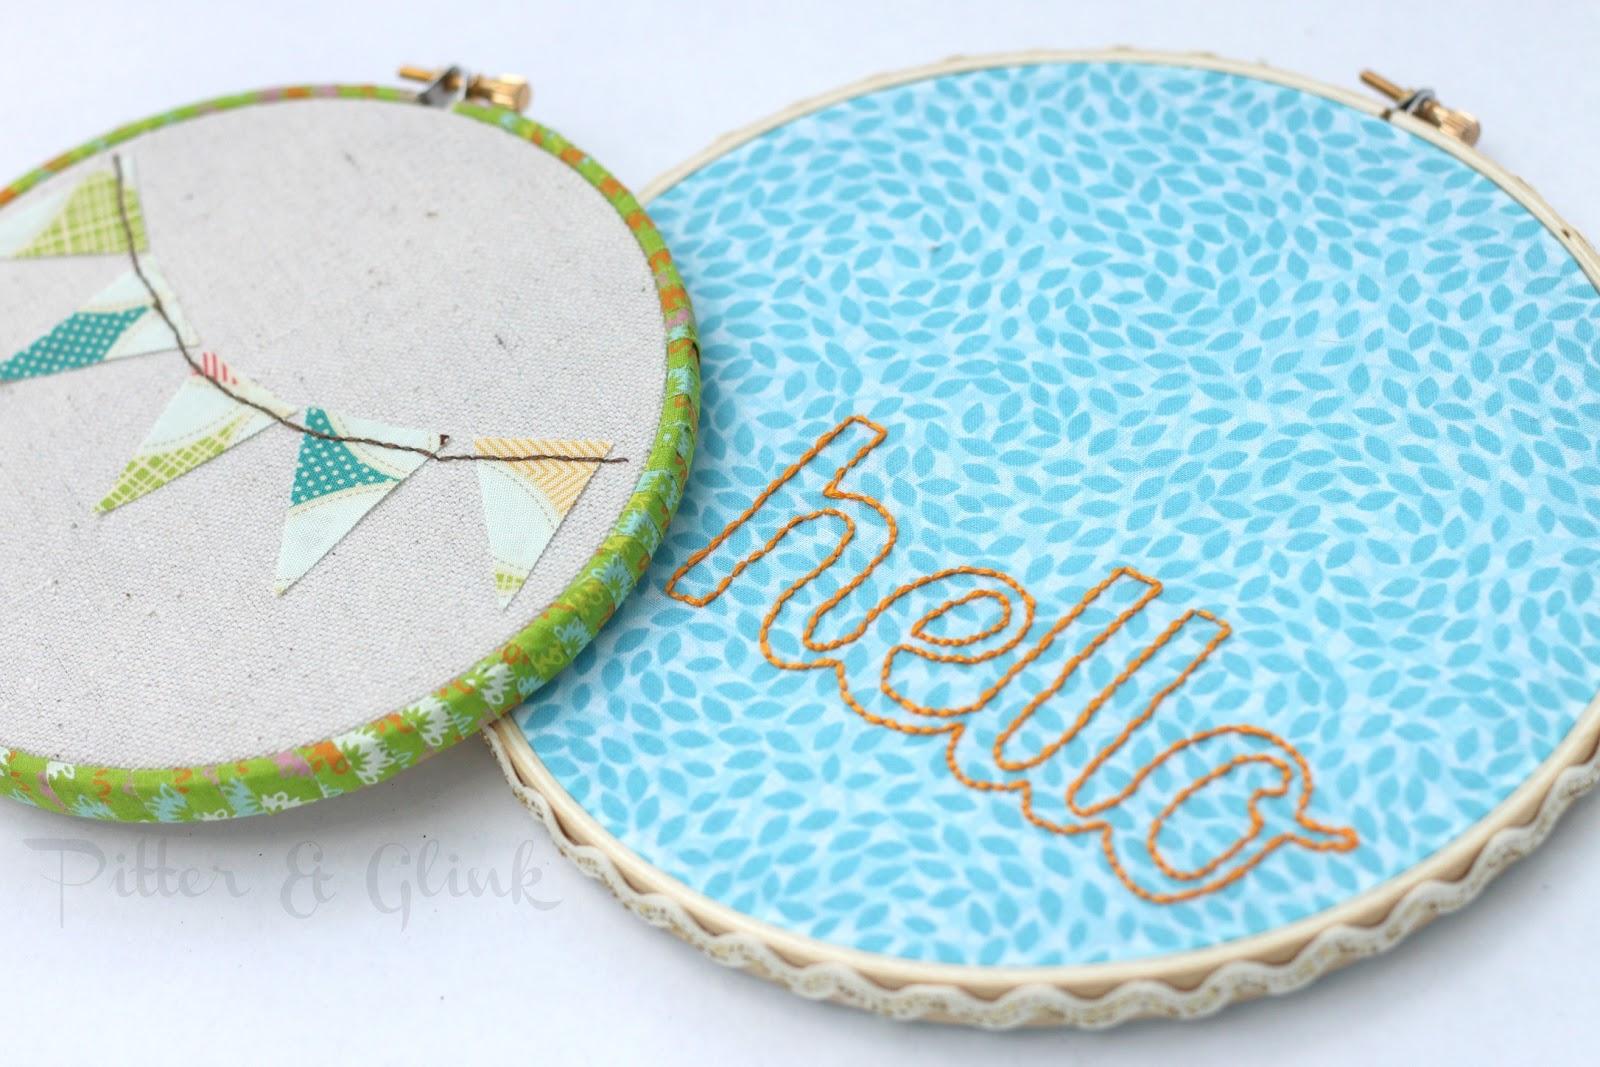 Pitterandglink embroidery hoop art